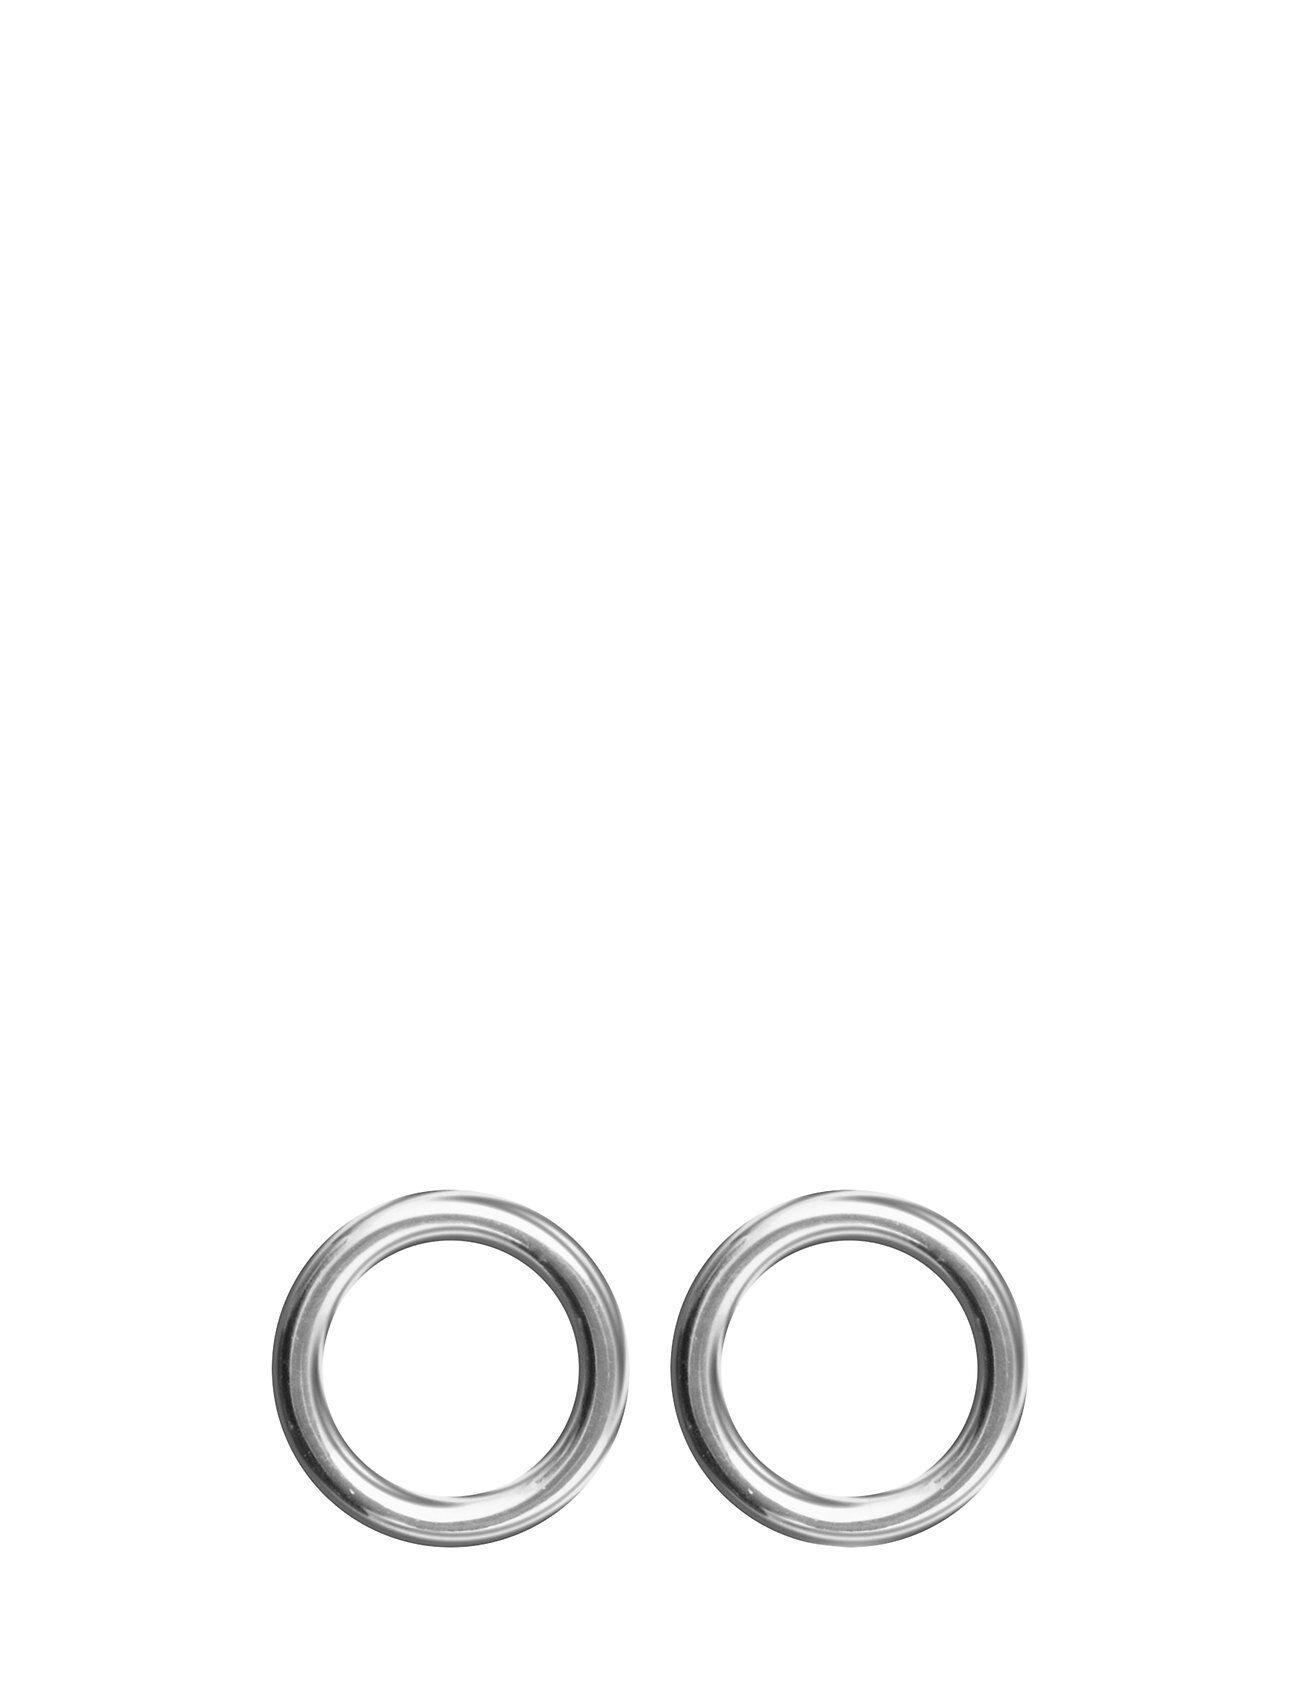 SOPHIE by SOPHIE Circle Studs Accessories Jewellery Earrings Studs Hopea SOPHIE By SOPHIE